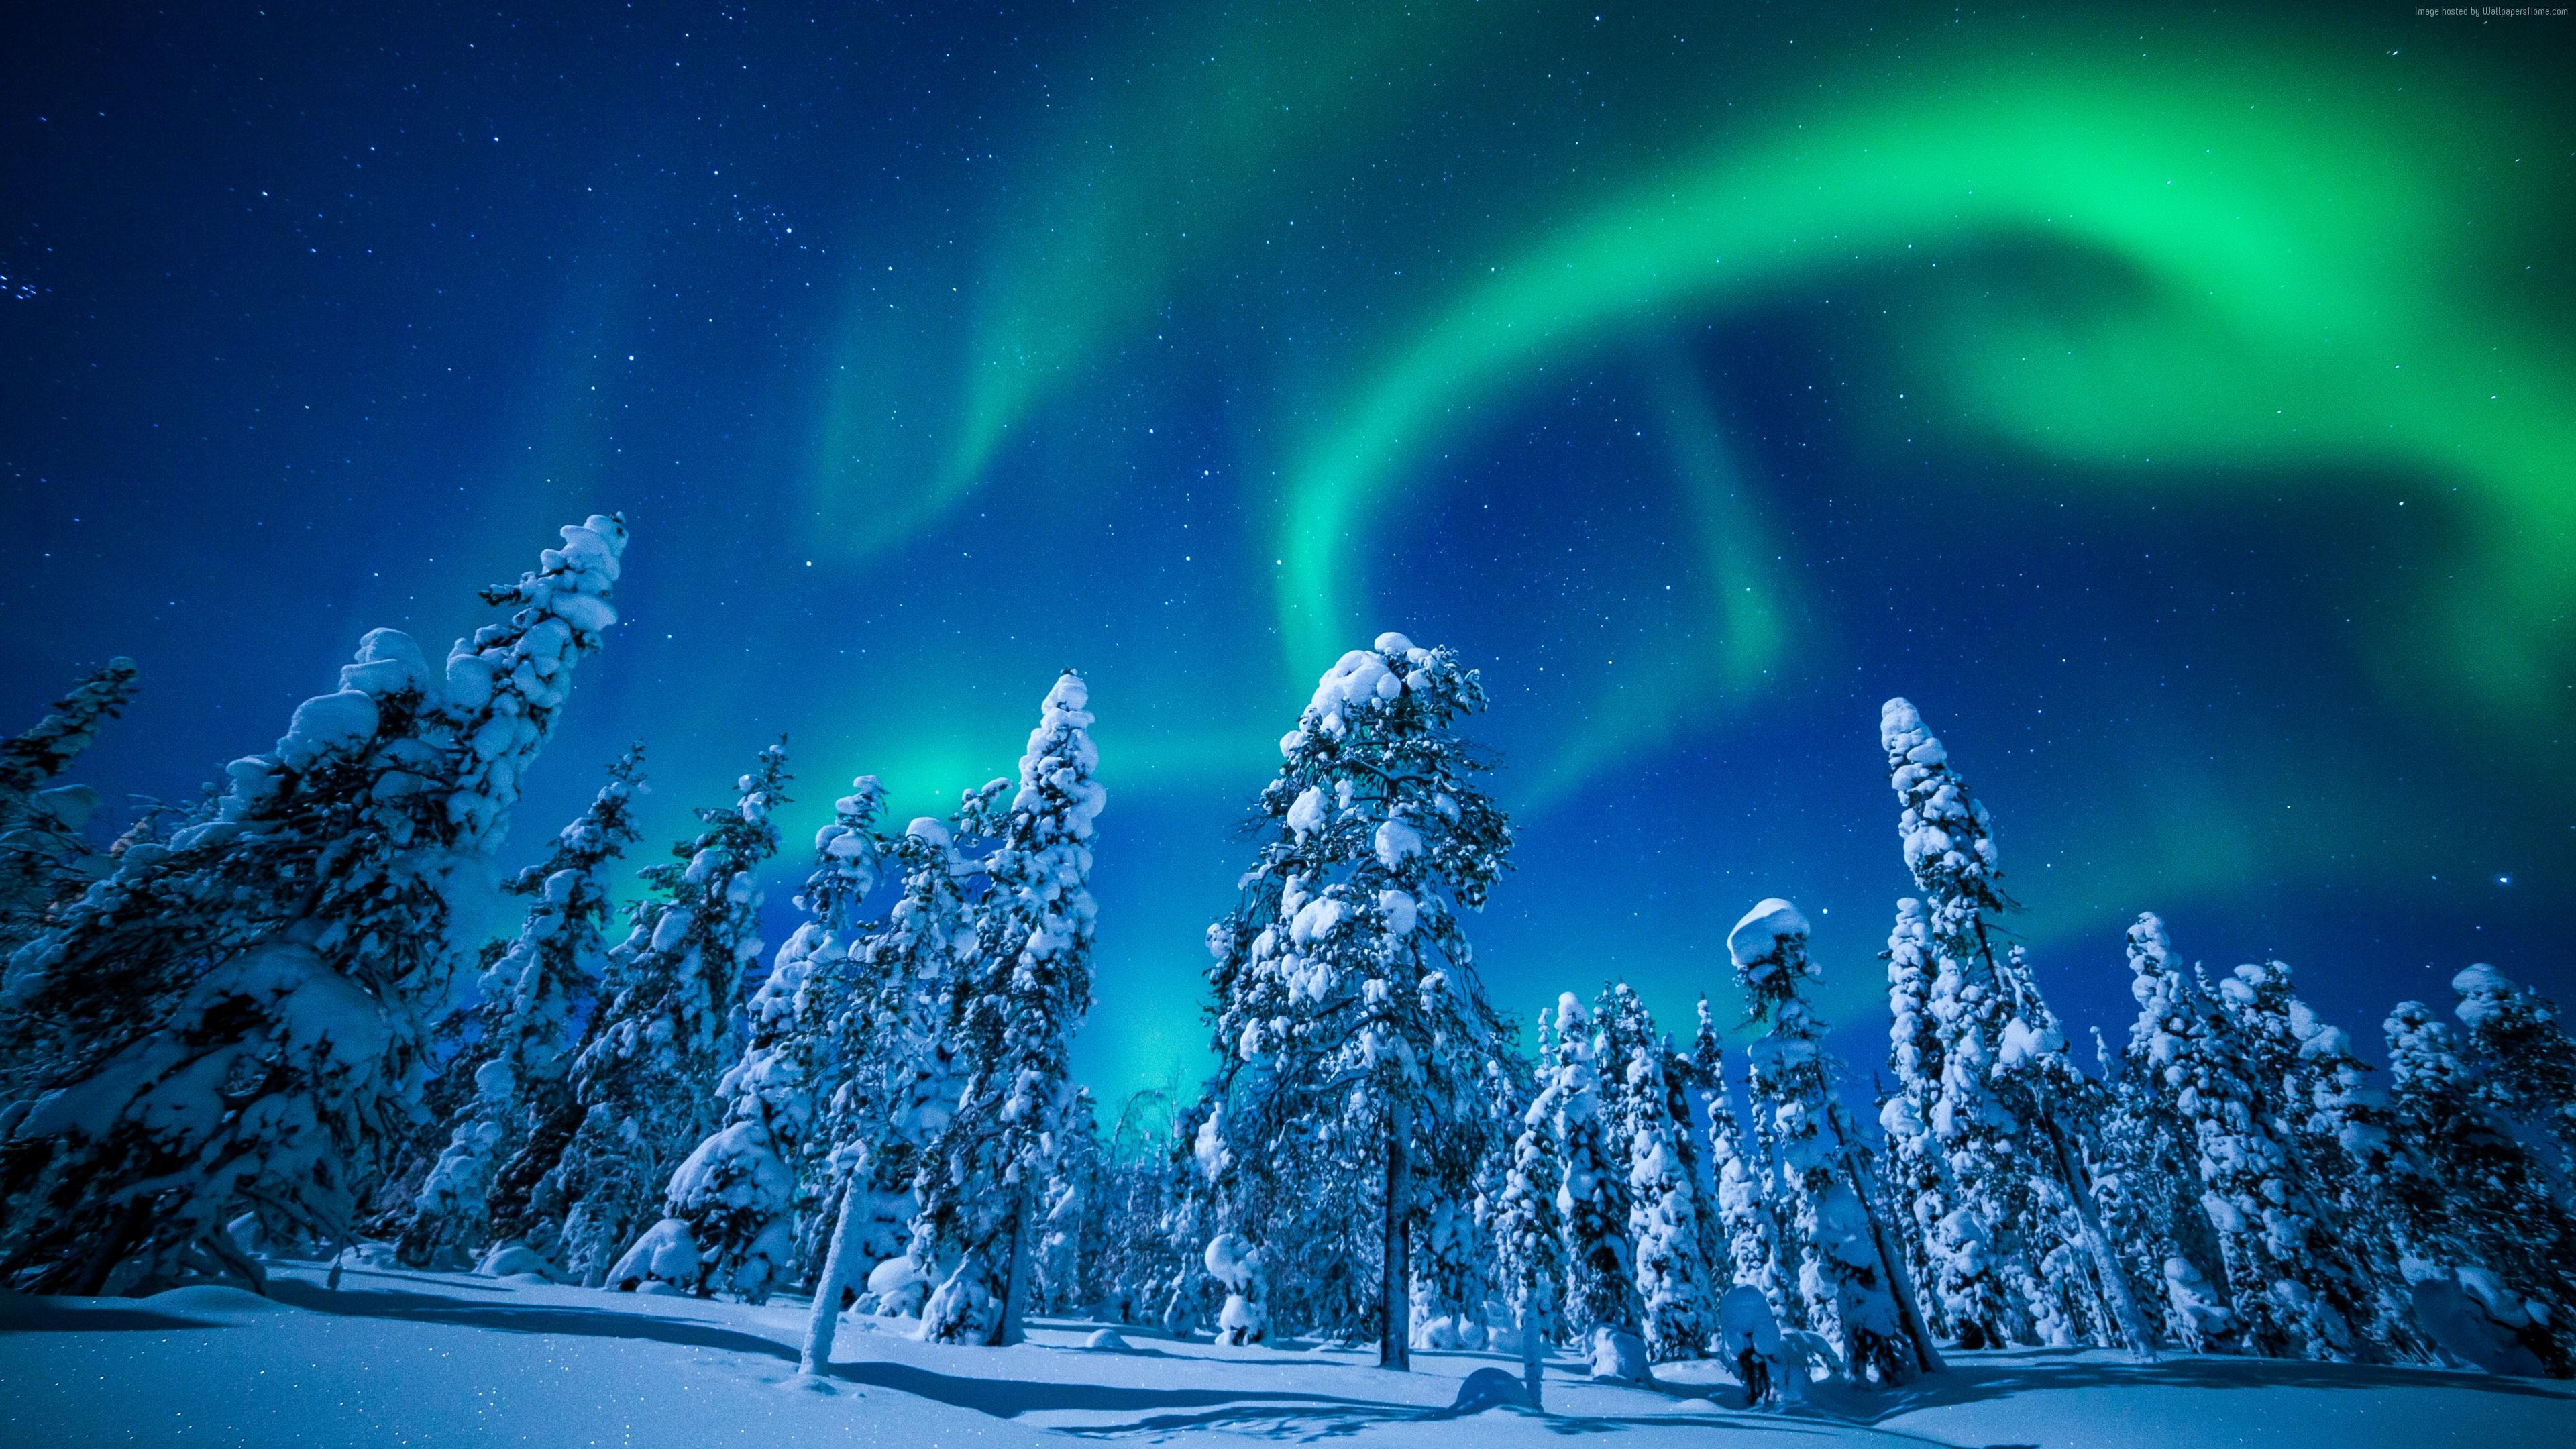 Wallpaper Lapland Finland Winter Snow Tree Night Northern Lights 5k Nature